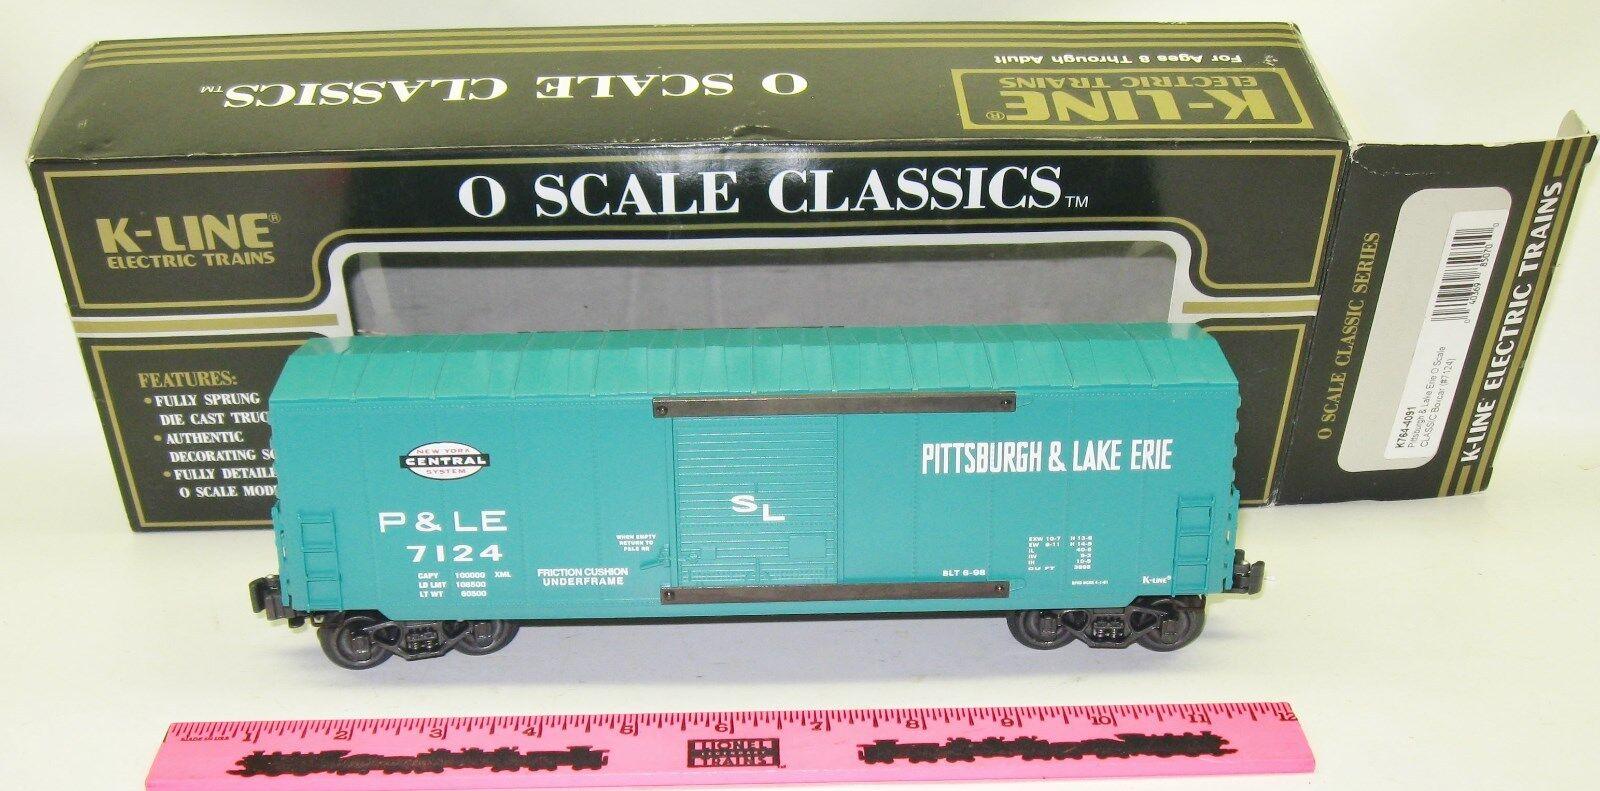 New K-Line K764-4091 Pittsburgh 7 Lake Erie O scale classic Modern boxcar (